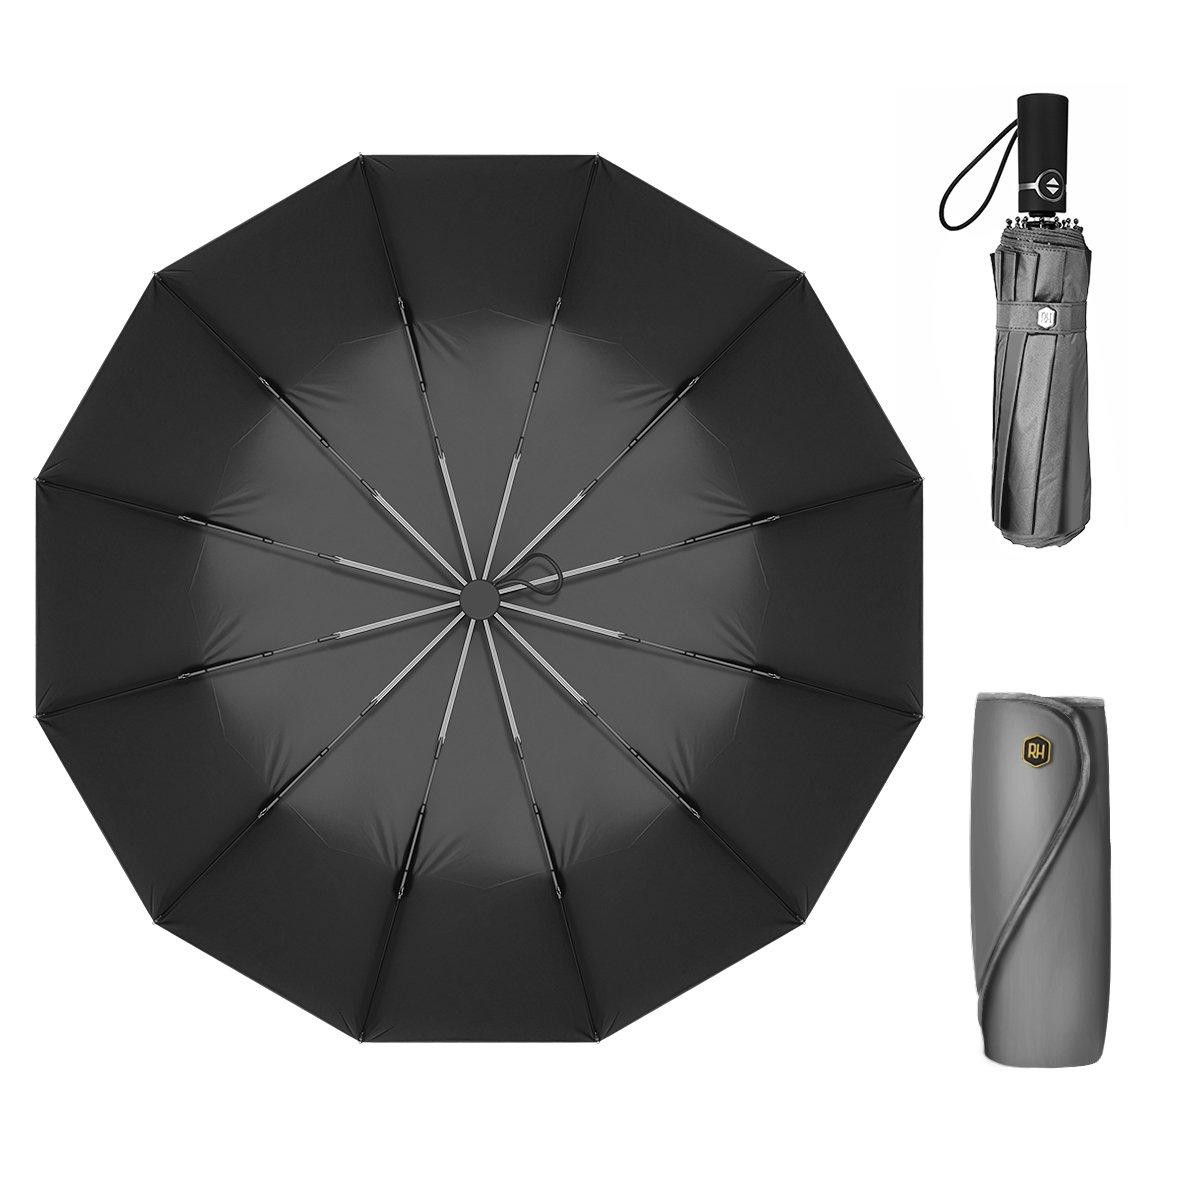 12 Ribs Travel Umbrella Windproof-Compact Umbrella Foldable with Auto Open/Close- Simplified Design Umbrella for Men&Women Ruxy Humy (Gray)